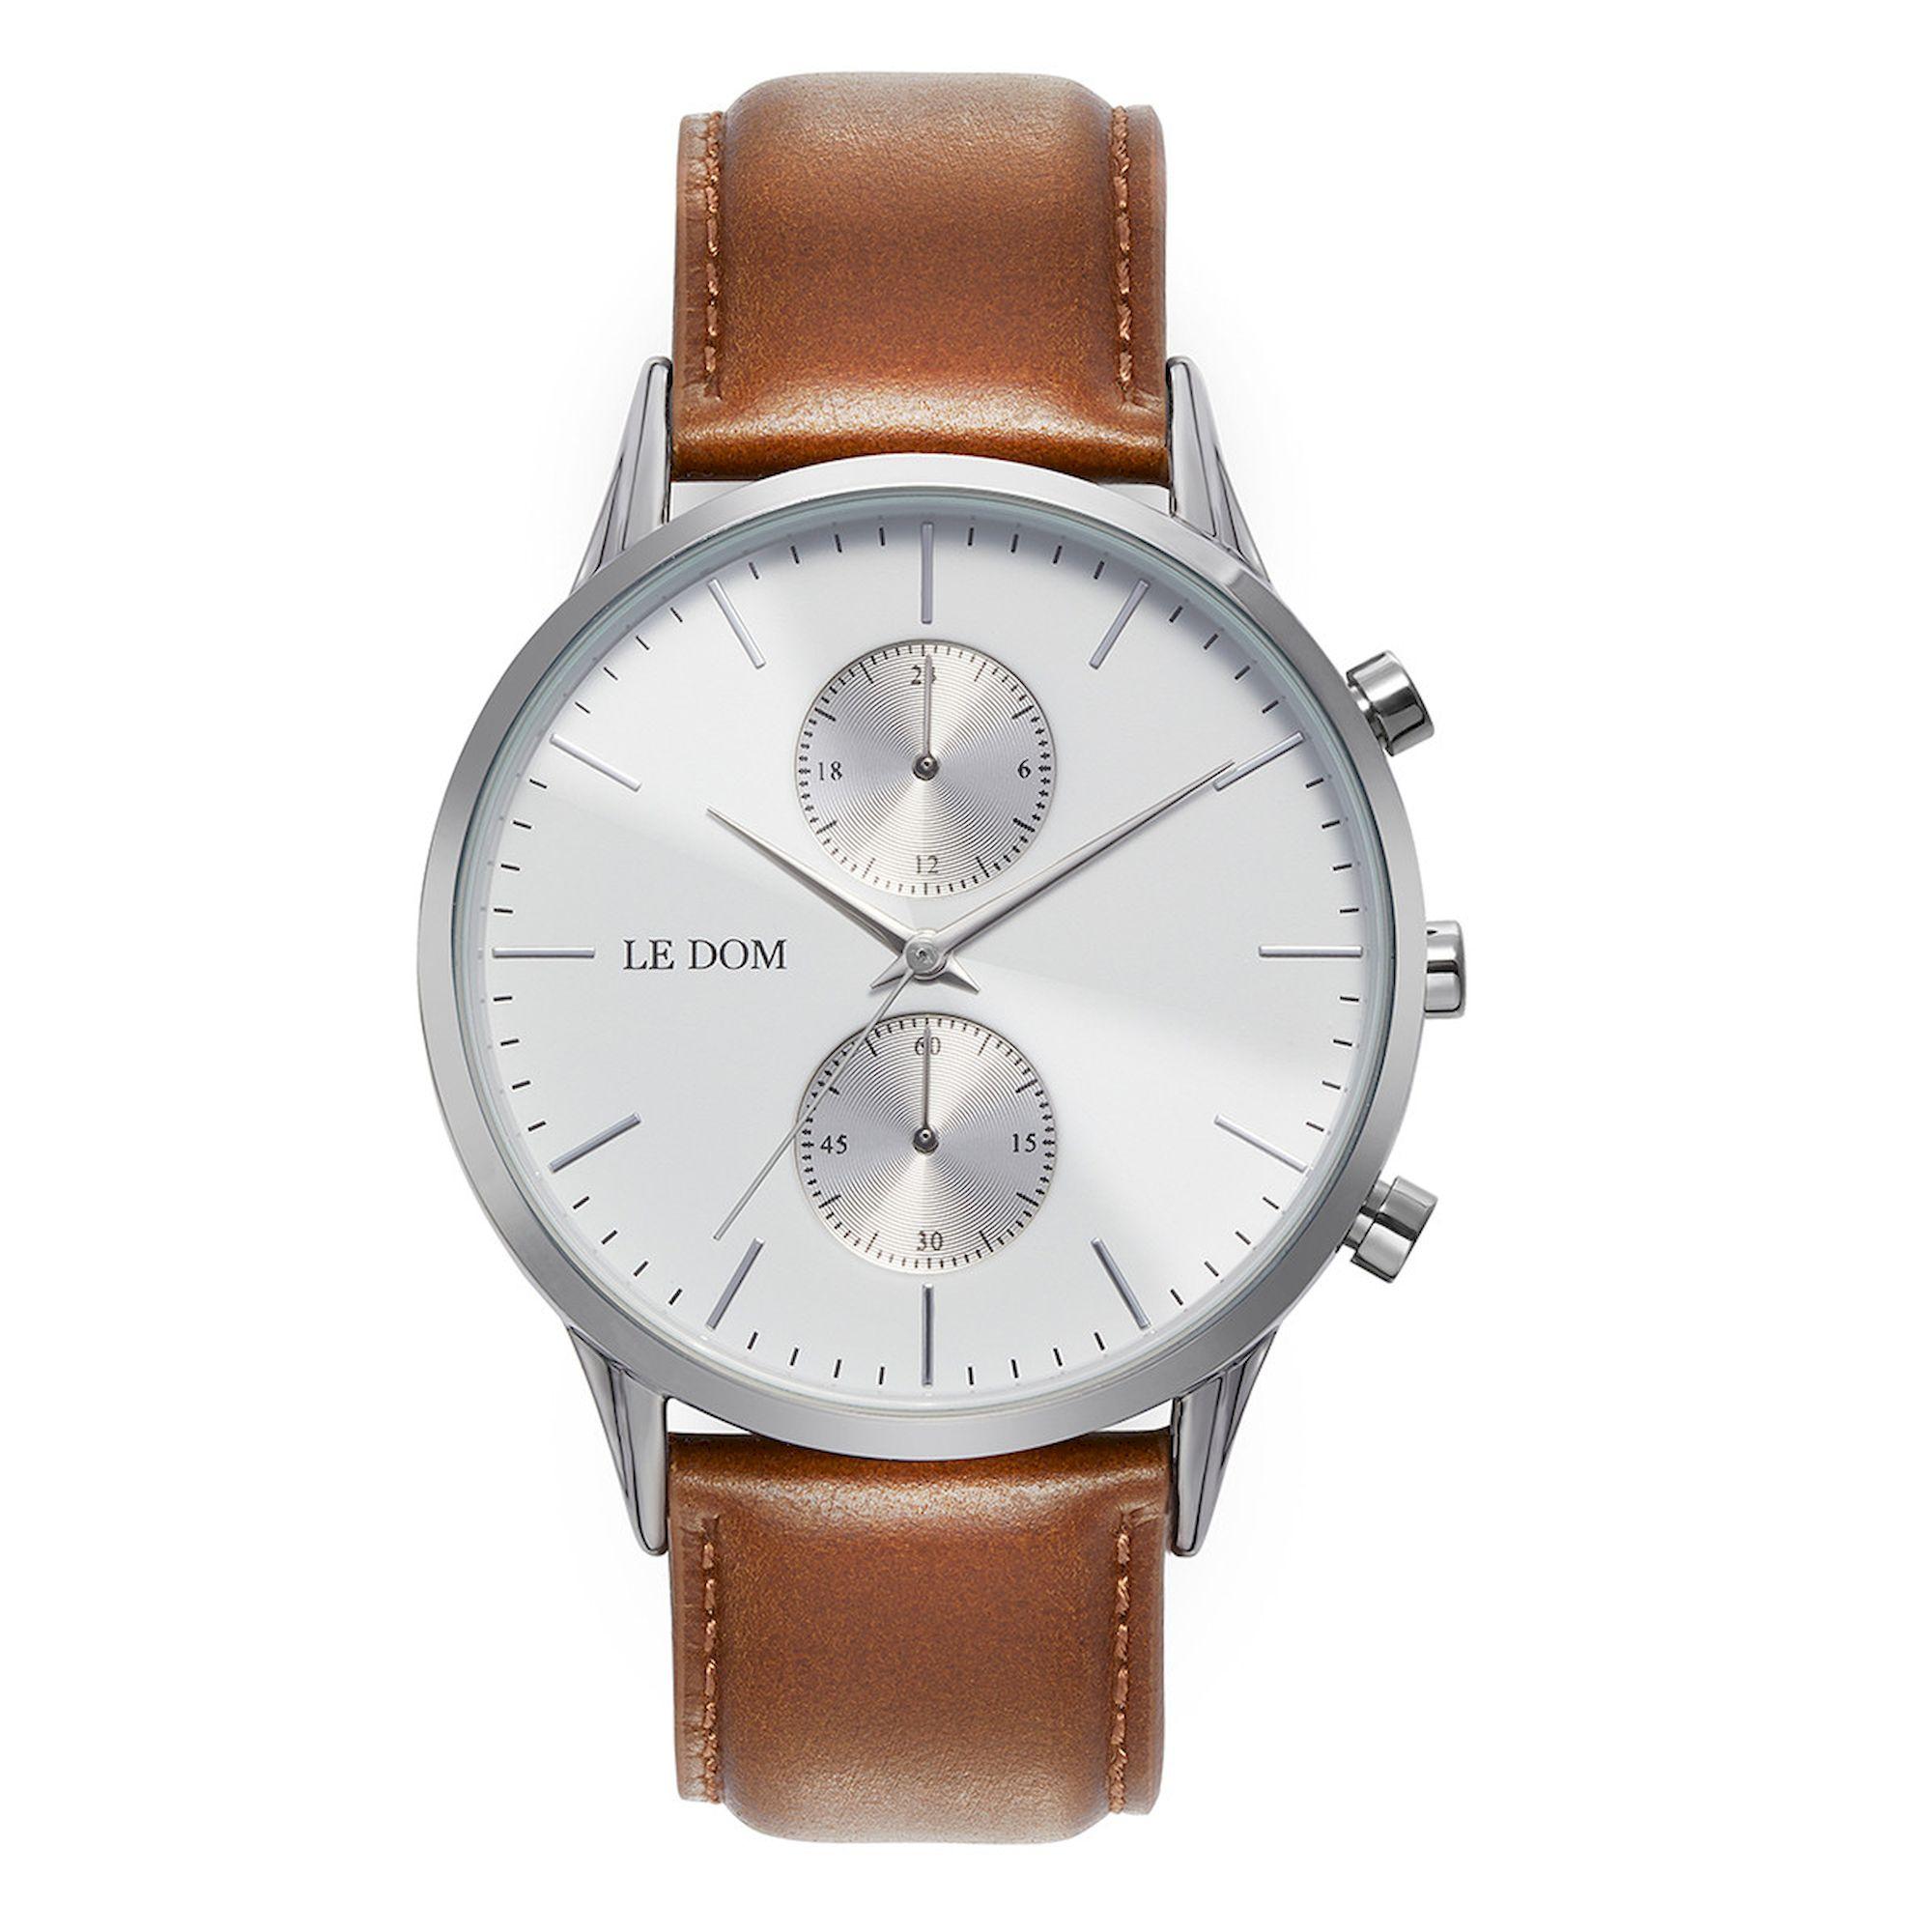 Le Dom Prime με Λευκό Καντράν Αld1002-13_1, le dom, ανδρικό ρολόι, ρολόγια, Δωρεάν έξοδα αποστολής, Άμεση ΔΙαθεσιμότητα, Le Dom Ρολόγια